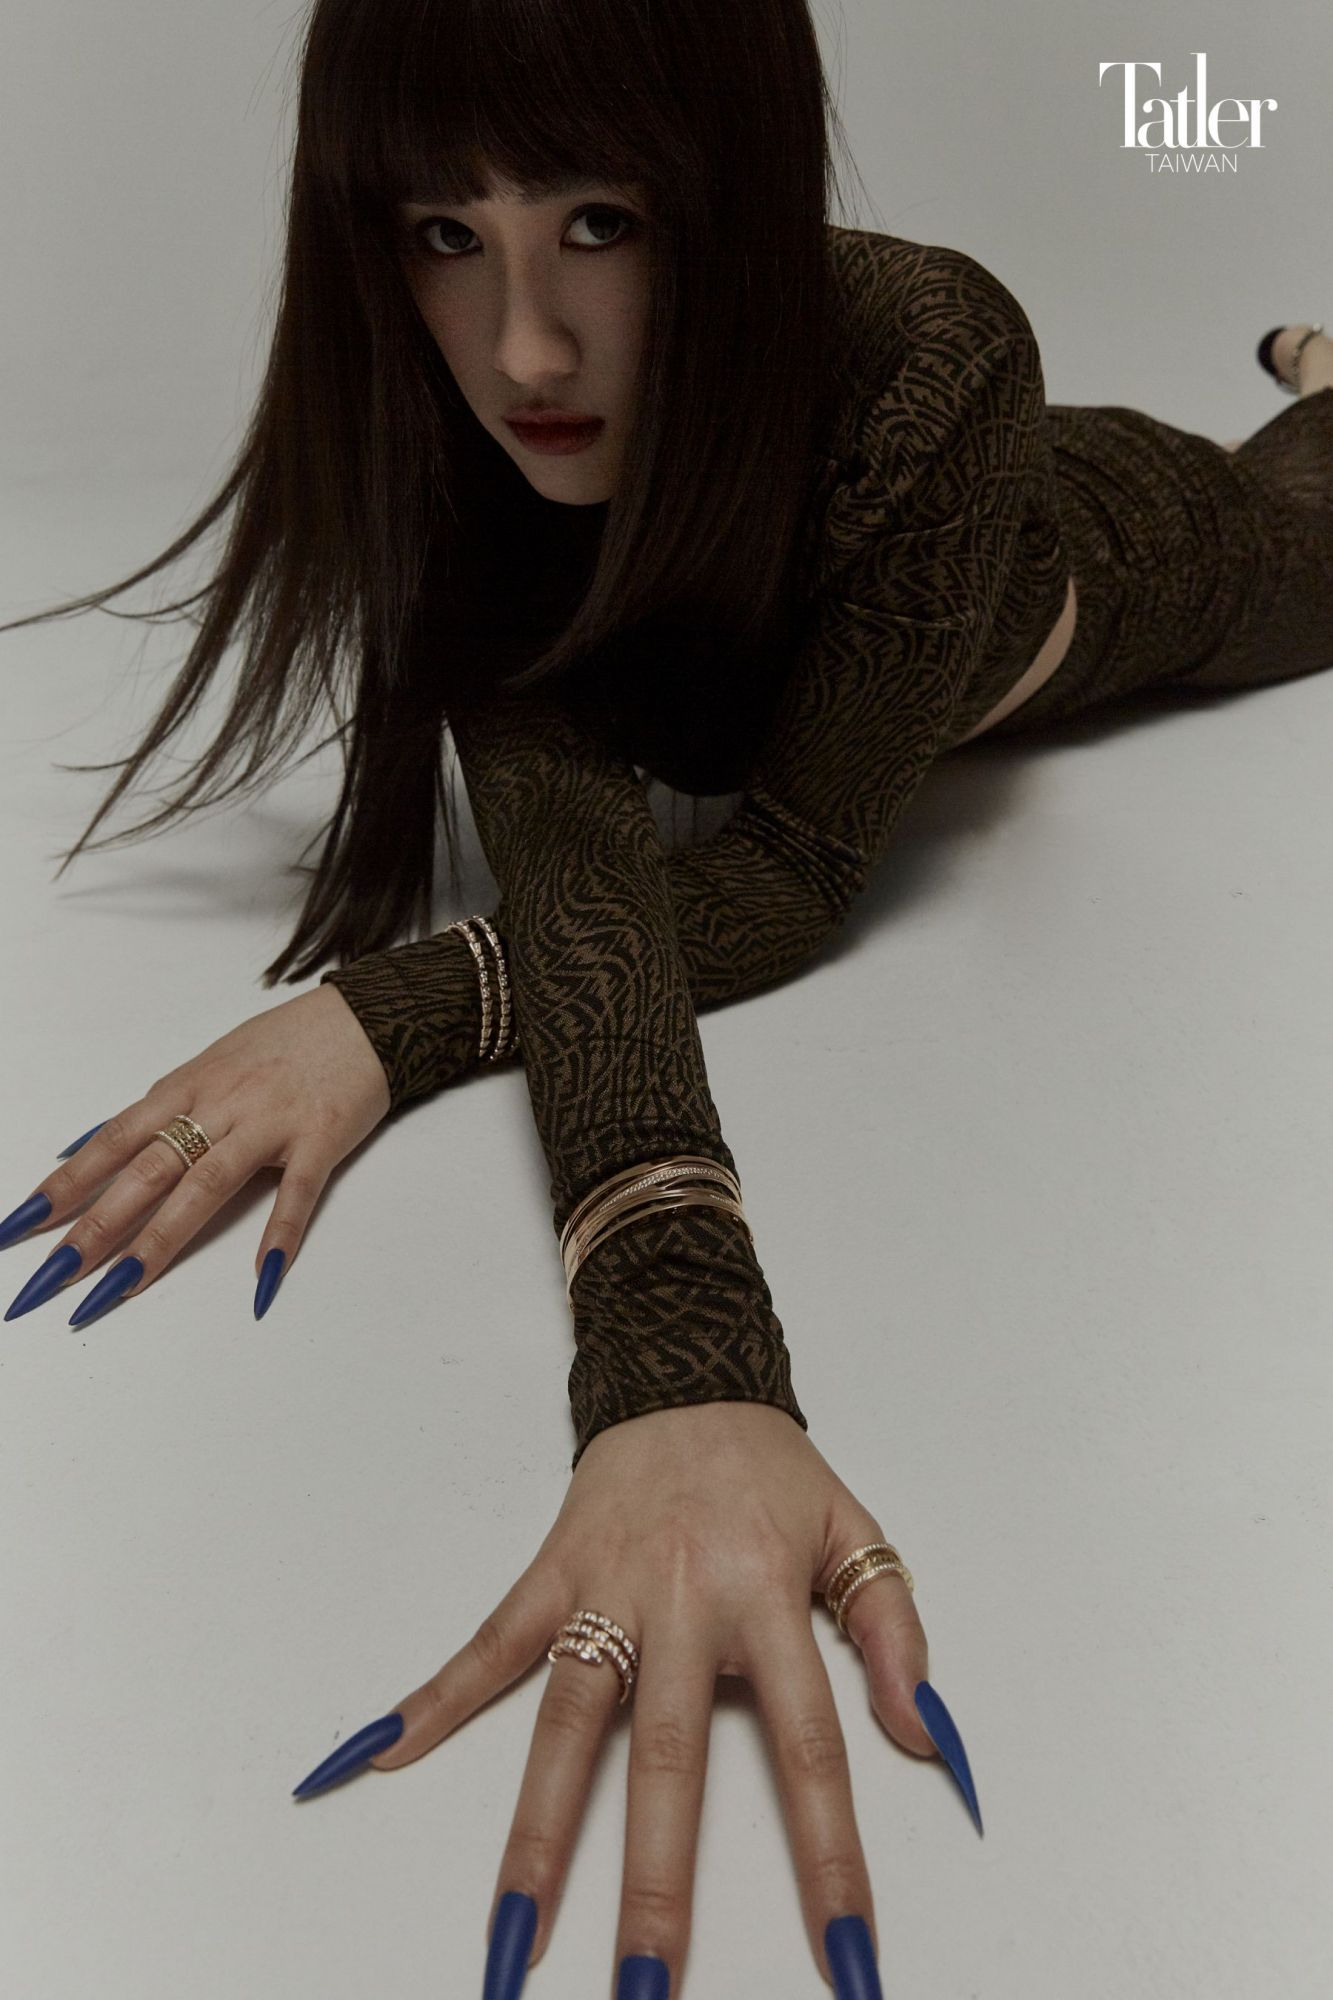 Vertigo 系列印花短上衣、抽繩長裙(Fendi);B.zero1 手環、Serpenti Viper 手環、Serpenti Viper 戒指、B.zero1 Rock 寬版戒指、B.zero1 Rock 戒指(All by Bulgari)。